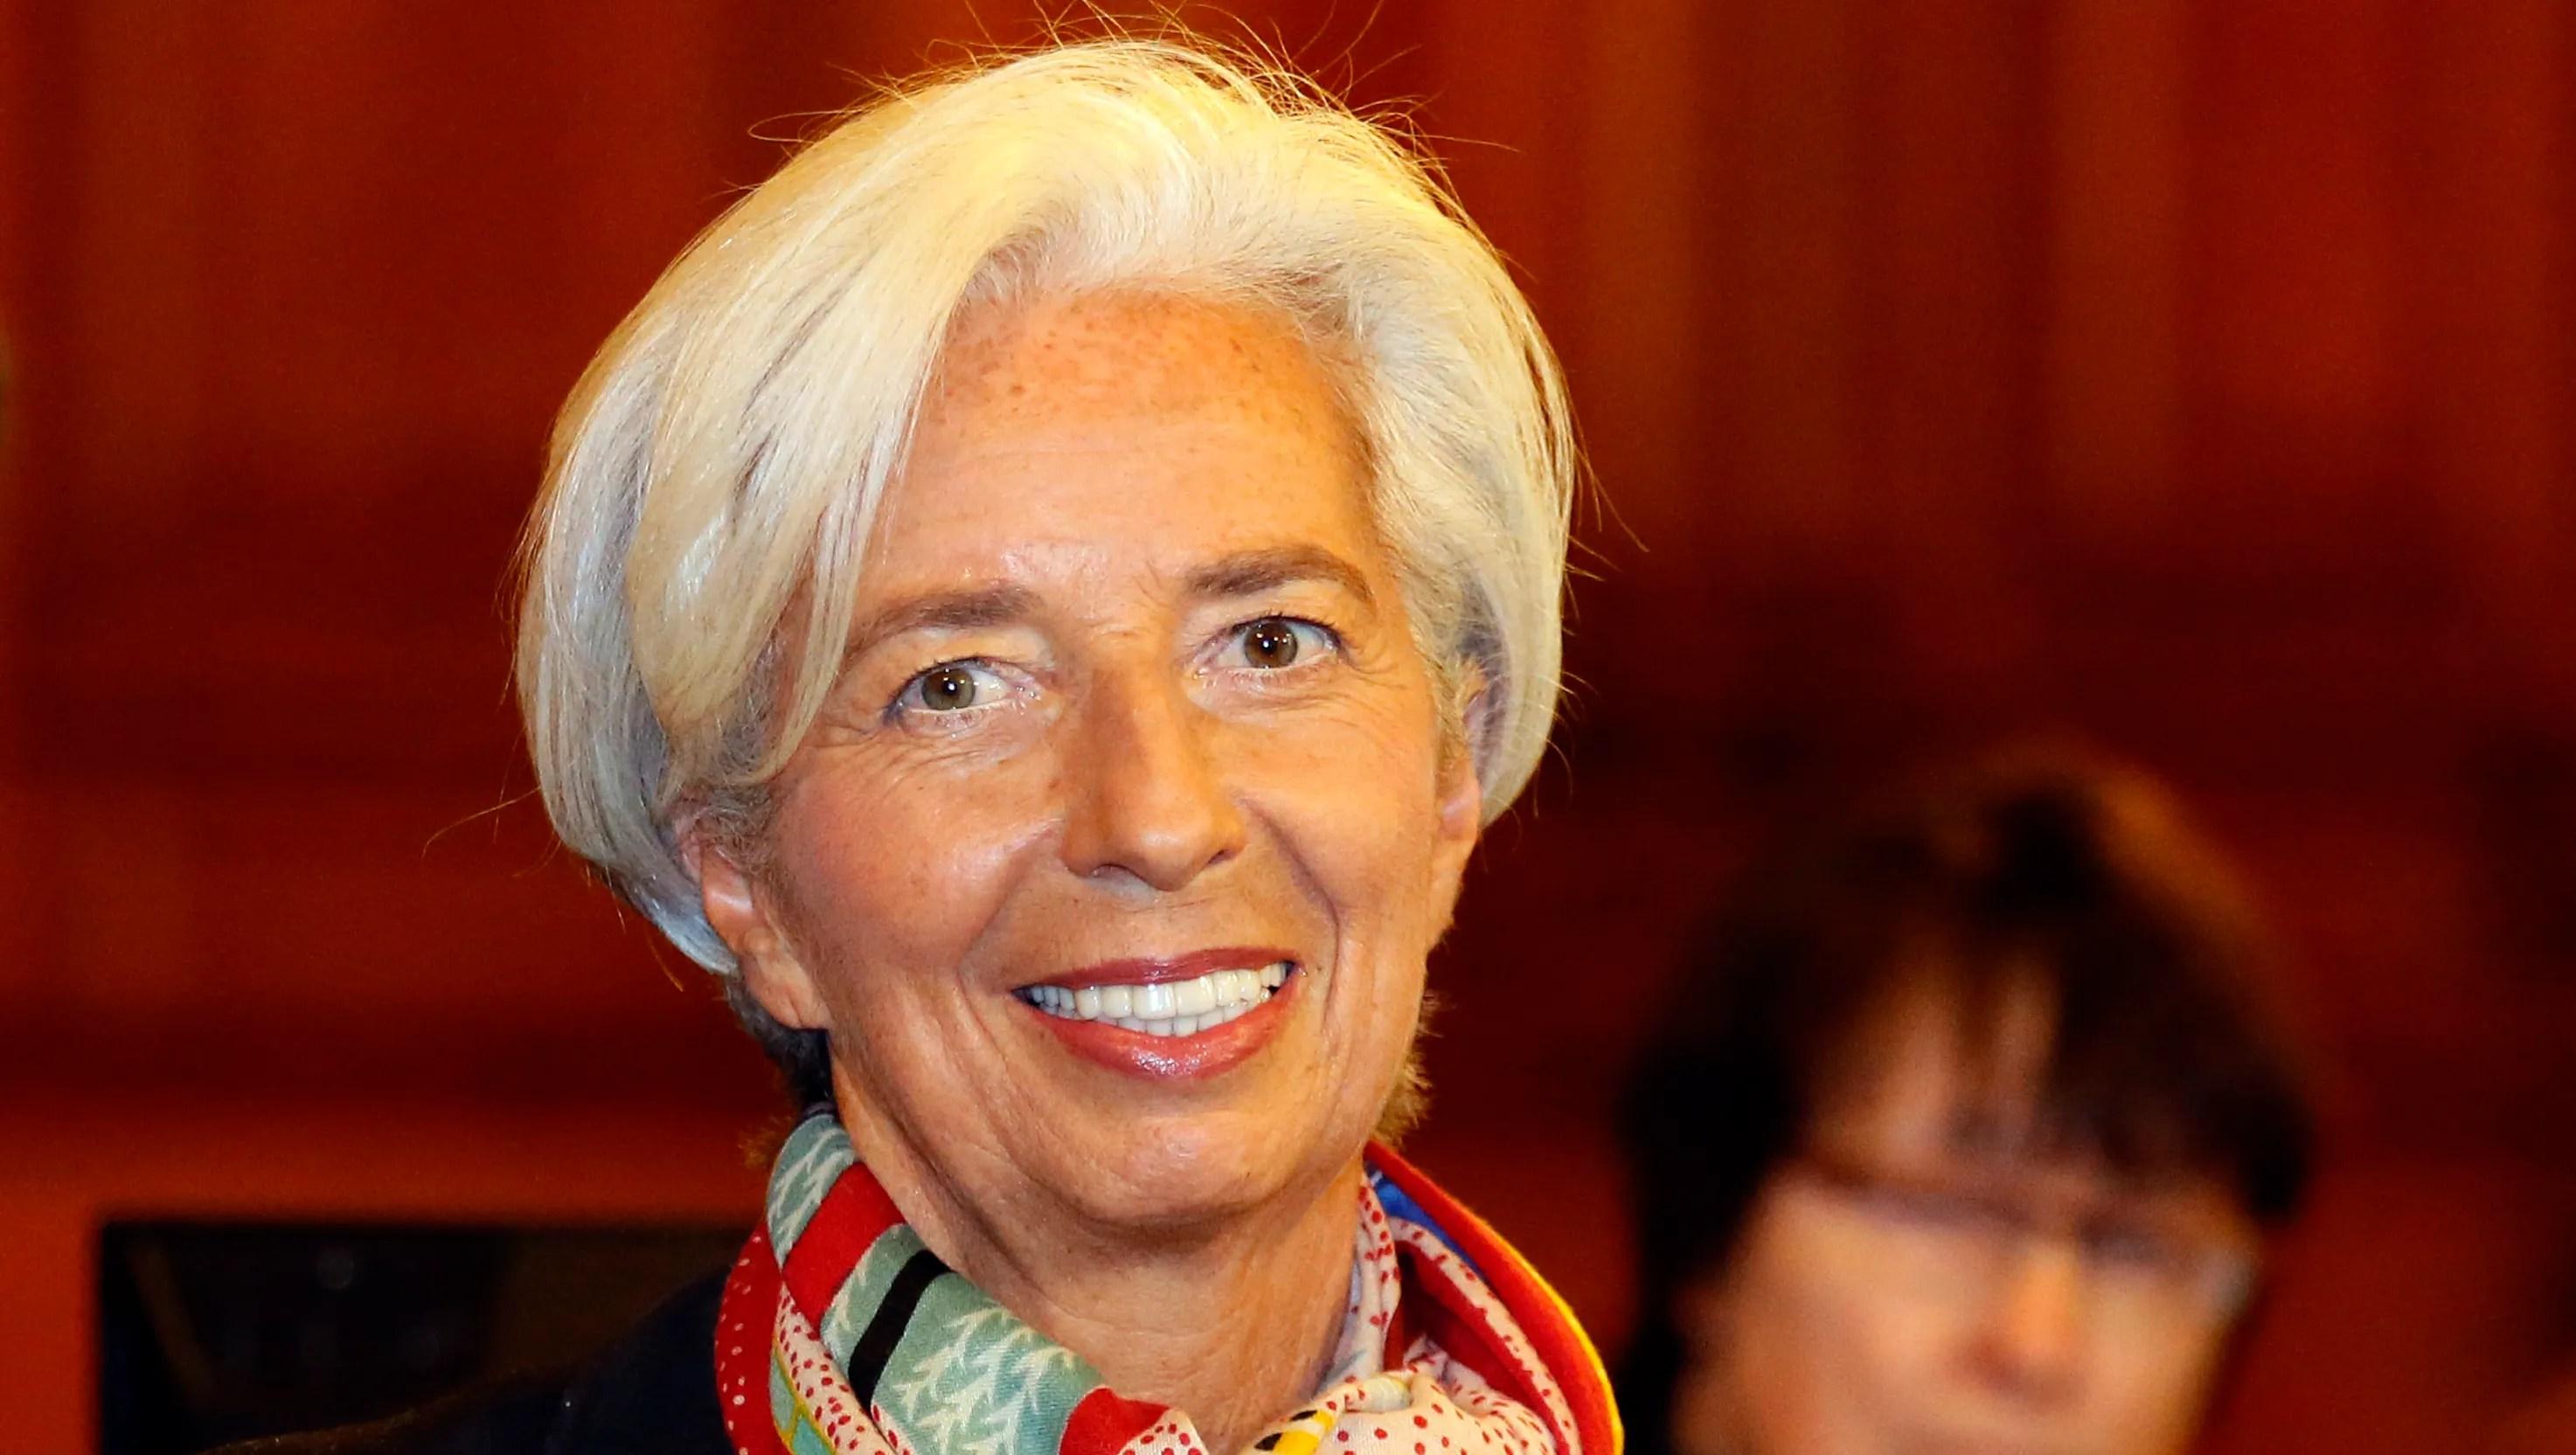 Facebook Christine Lagarde - Year of Clean Water